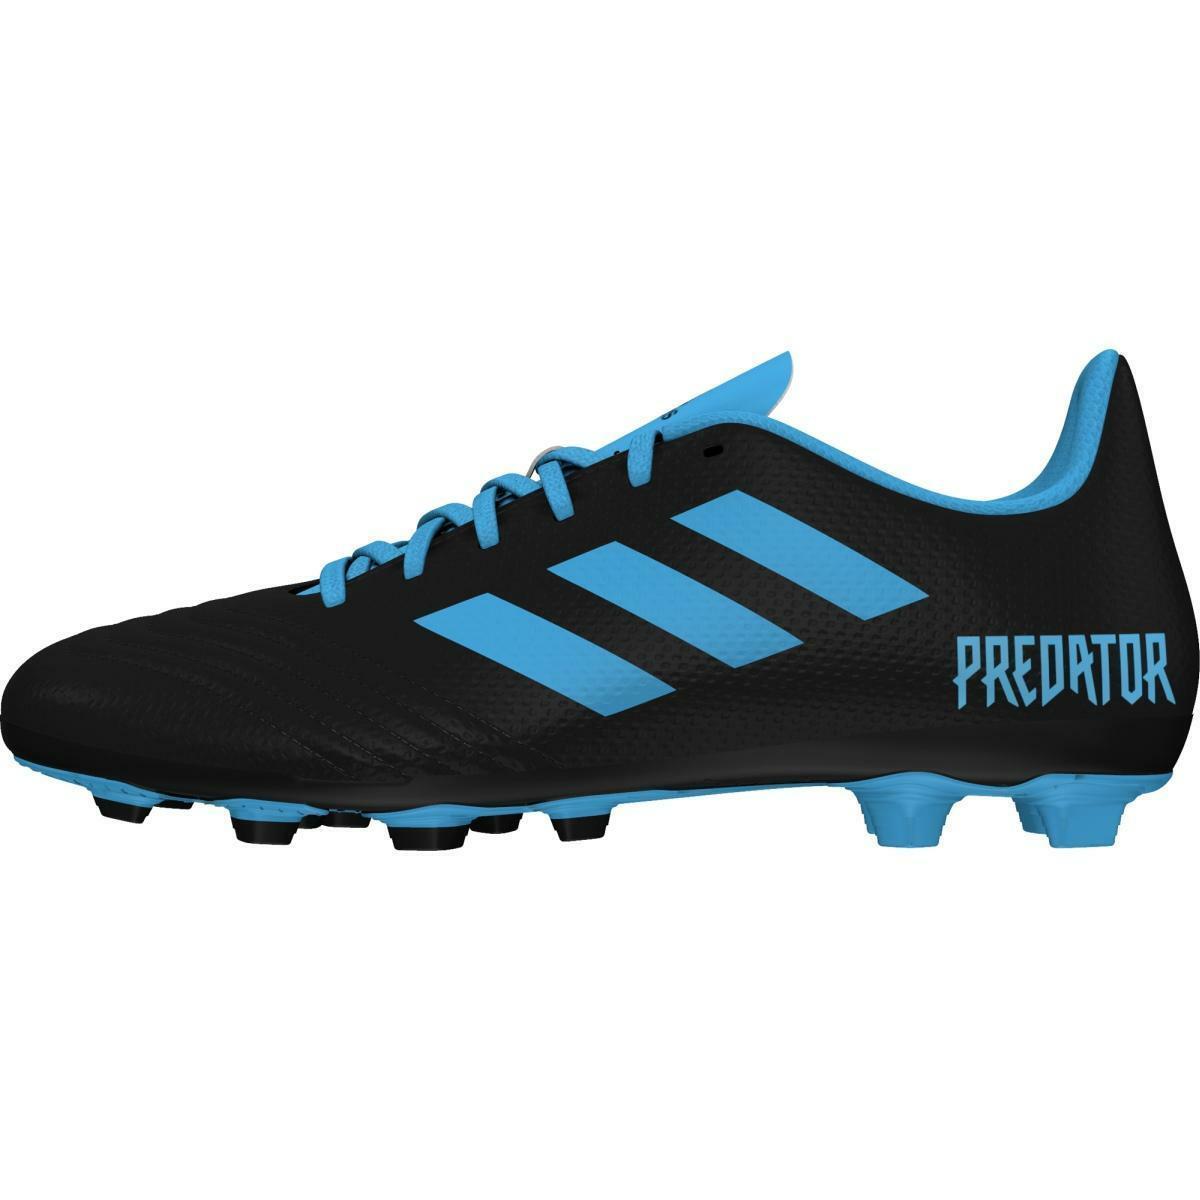 adidas adidas predator 19.4 fxg j bambino g25823 nero